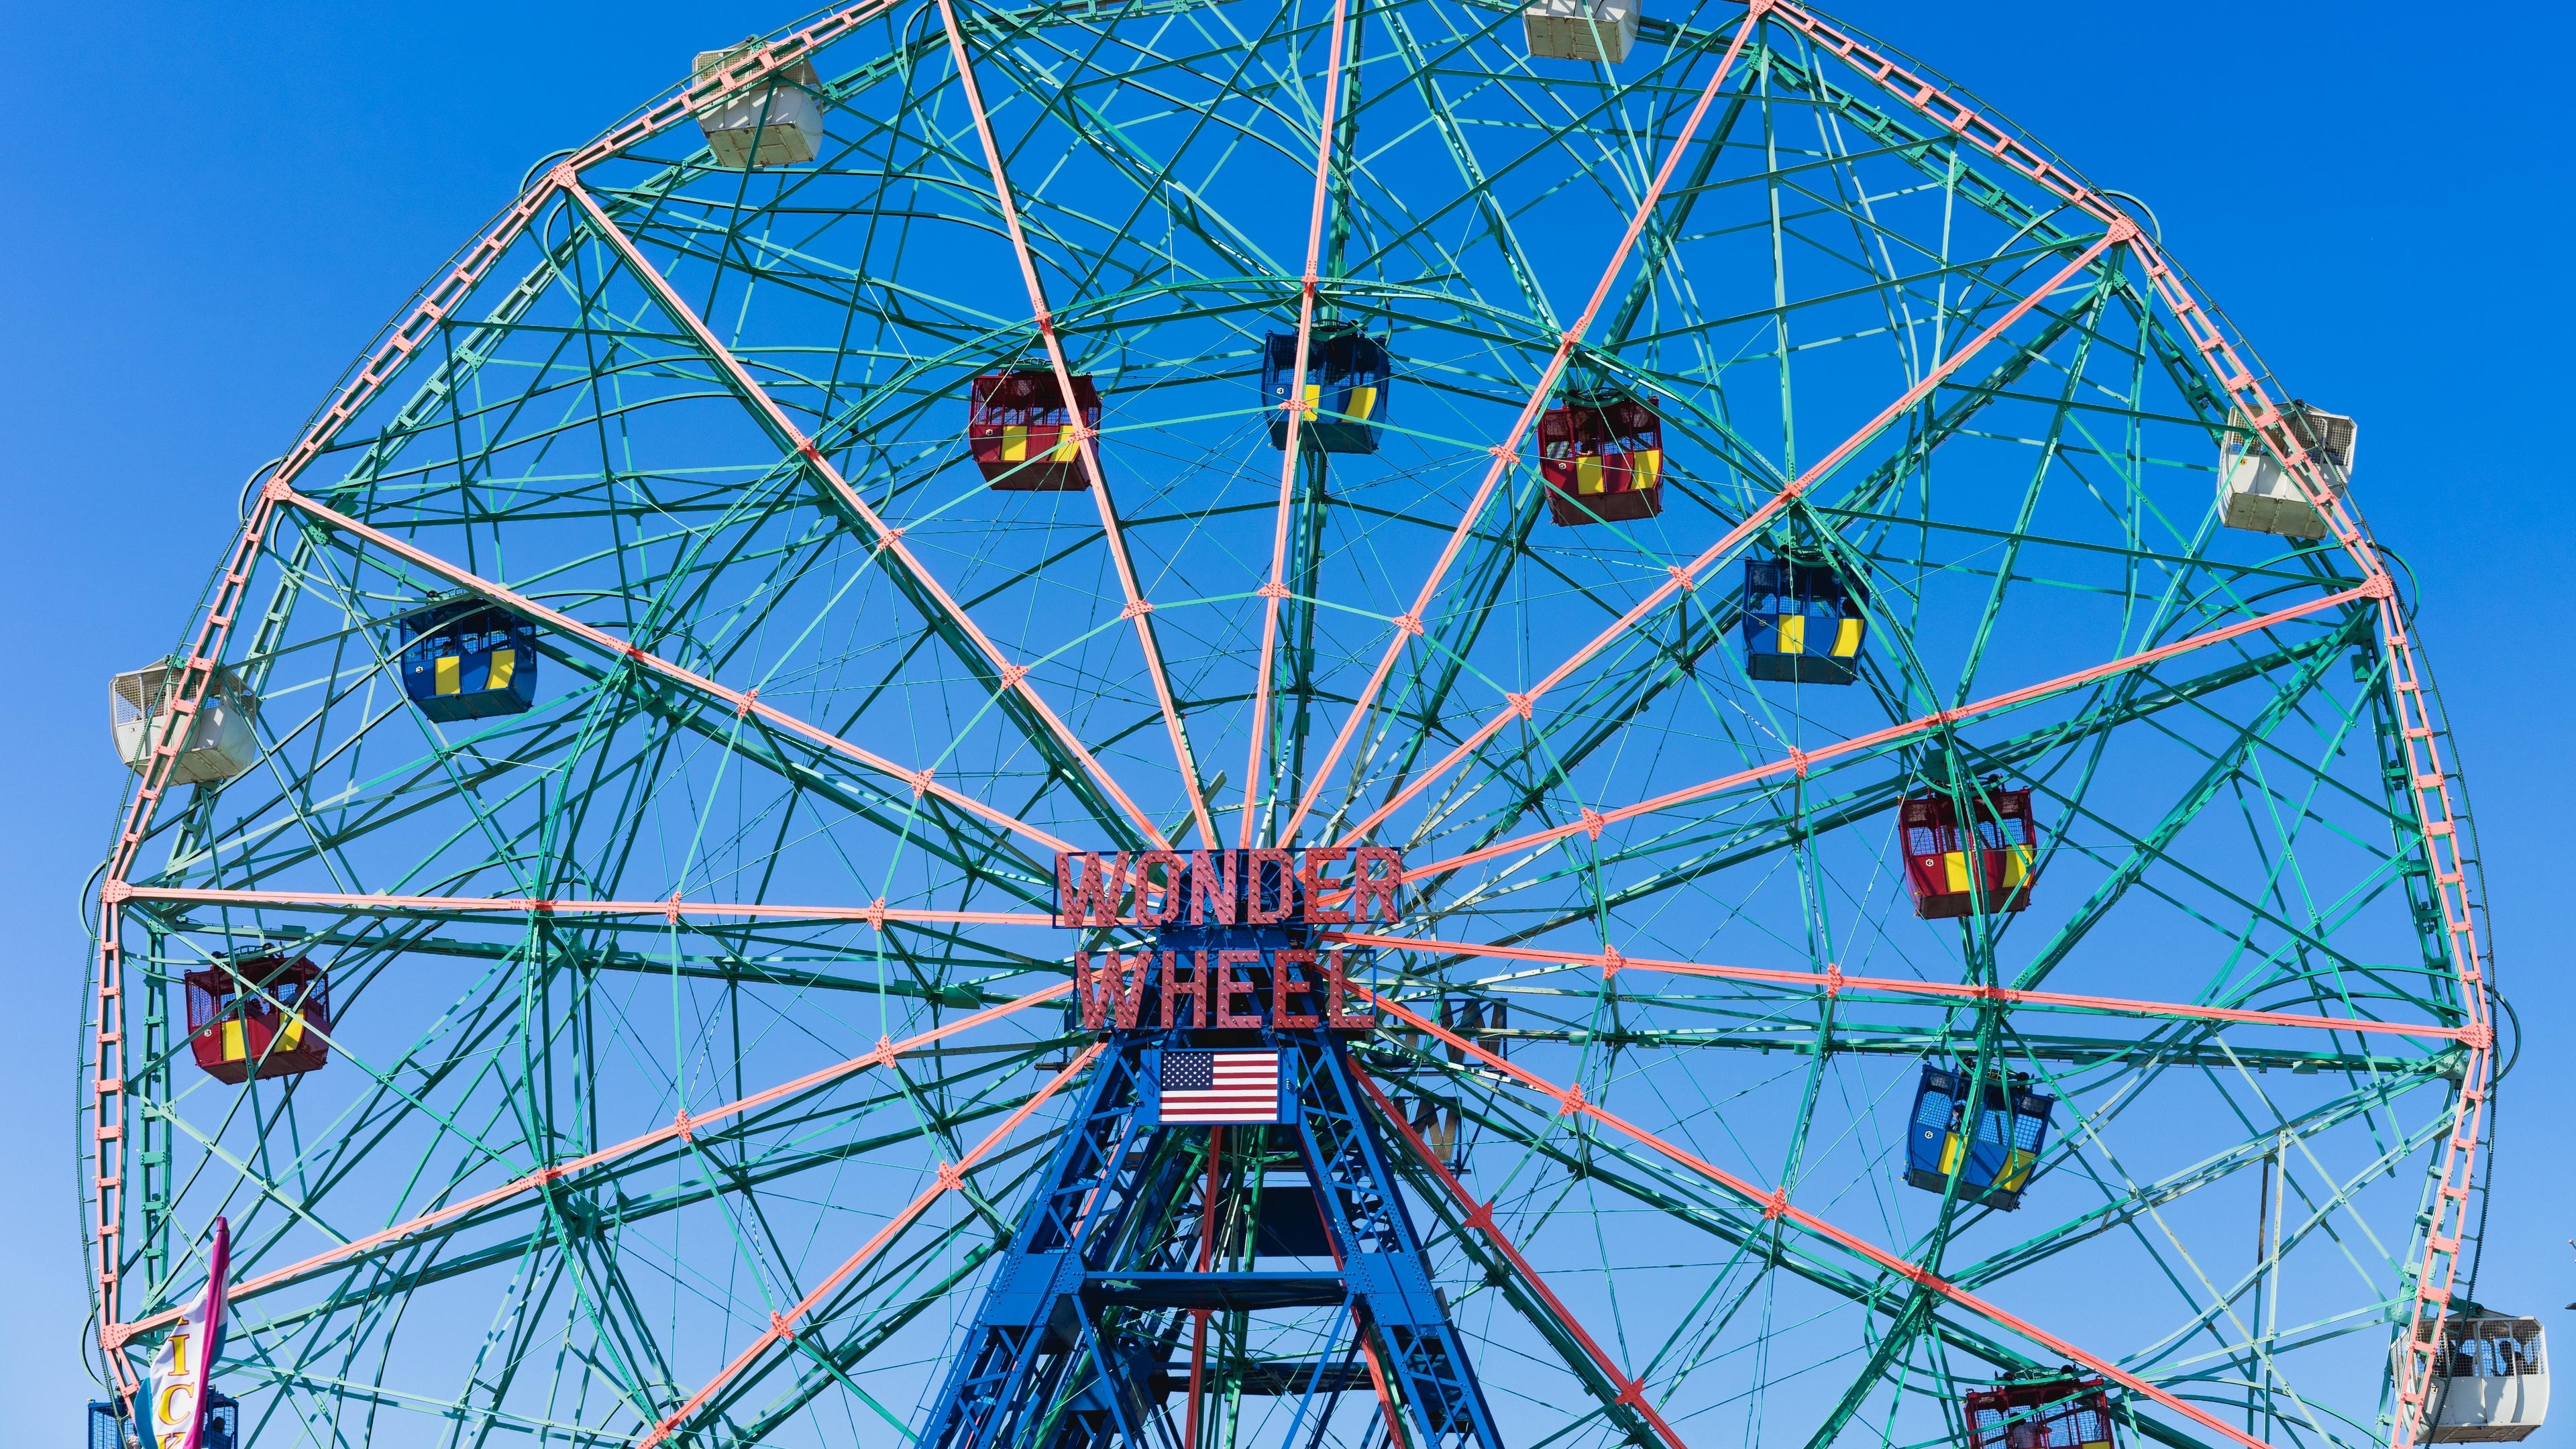 ferris wheel attraction city entertainment 4k 1538065043 - ferris wheel, attraction, city, entertainment 4k - ferris wheel, City, attraction